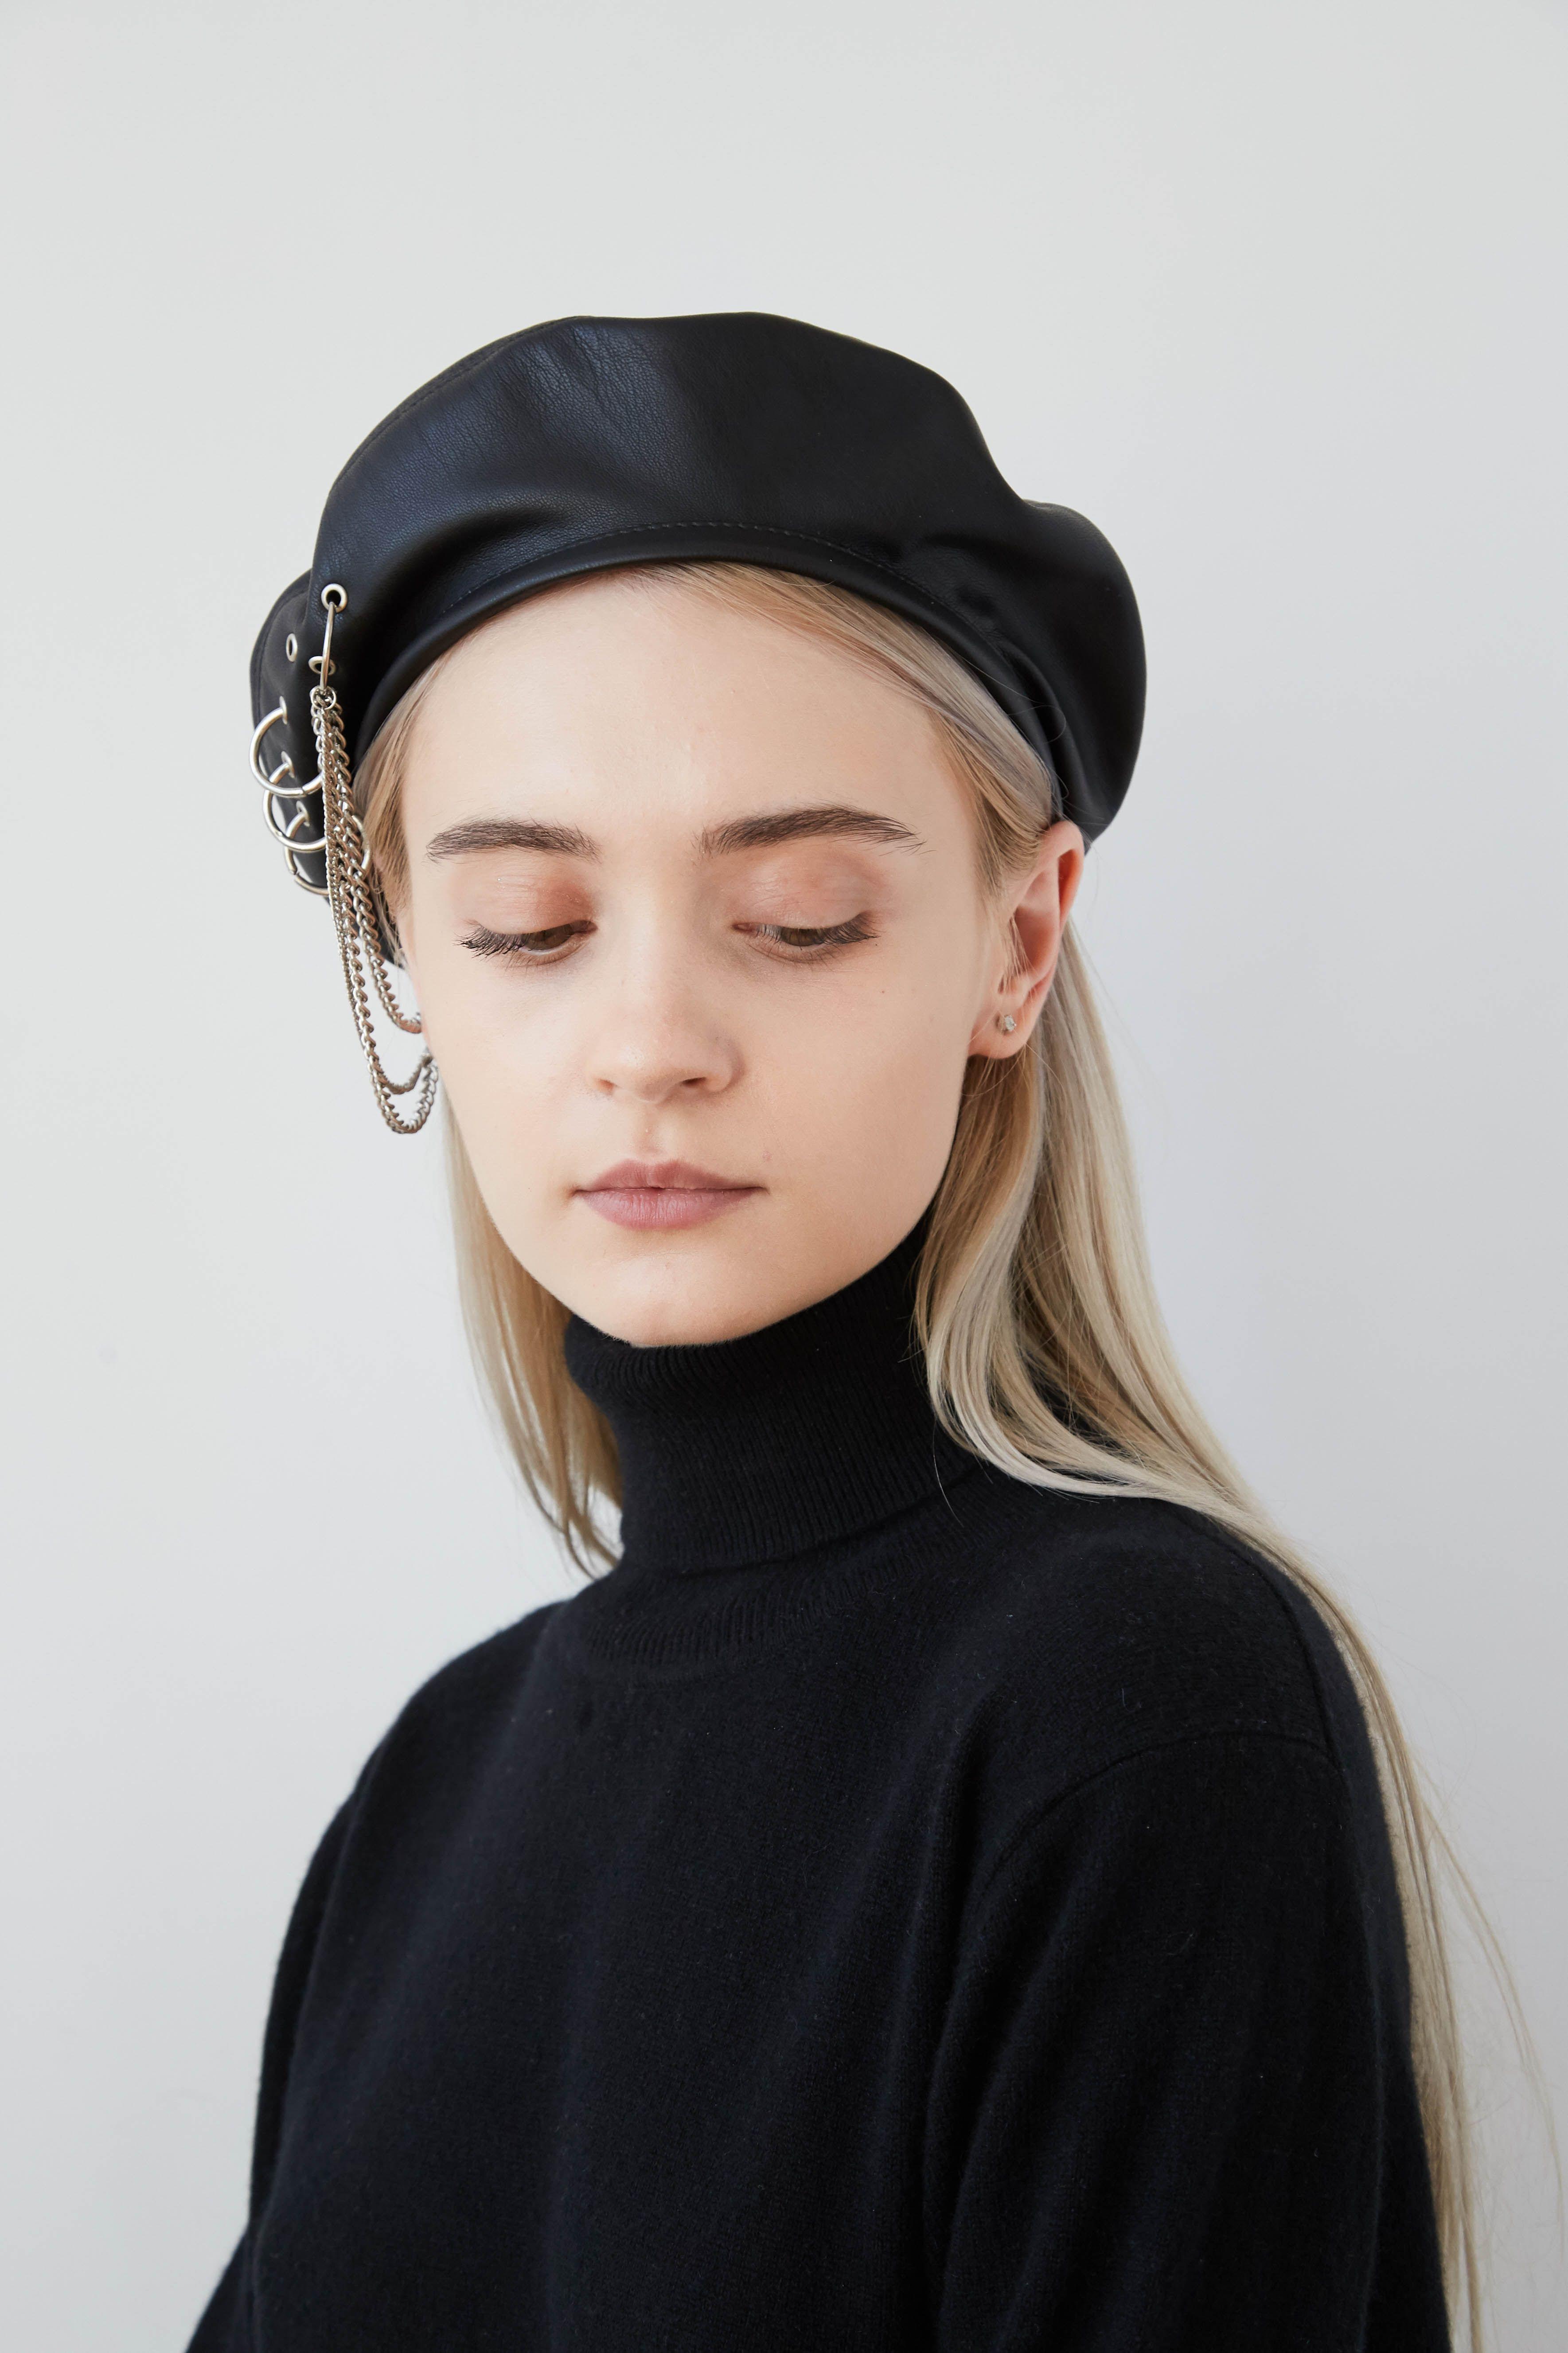 7acd05823af9e EVA Black eco leather beret with eyelets